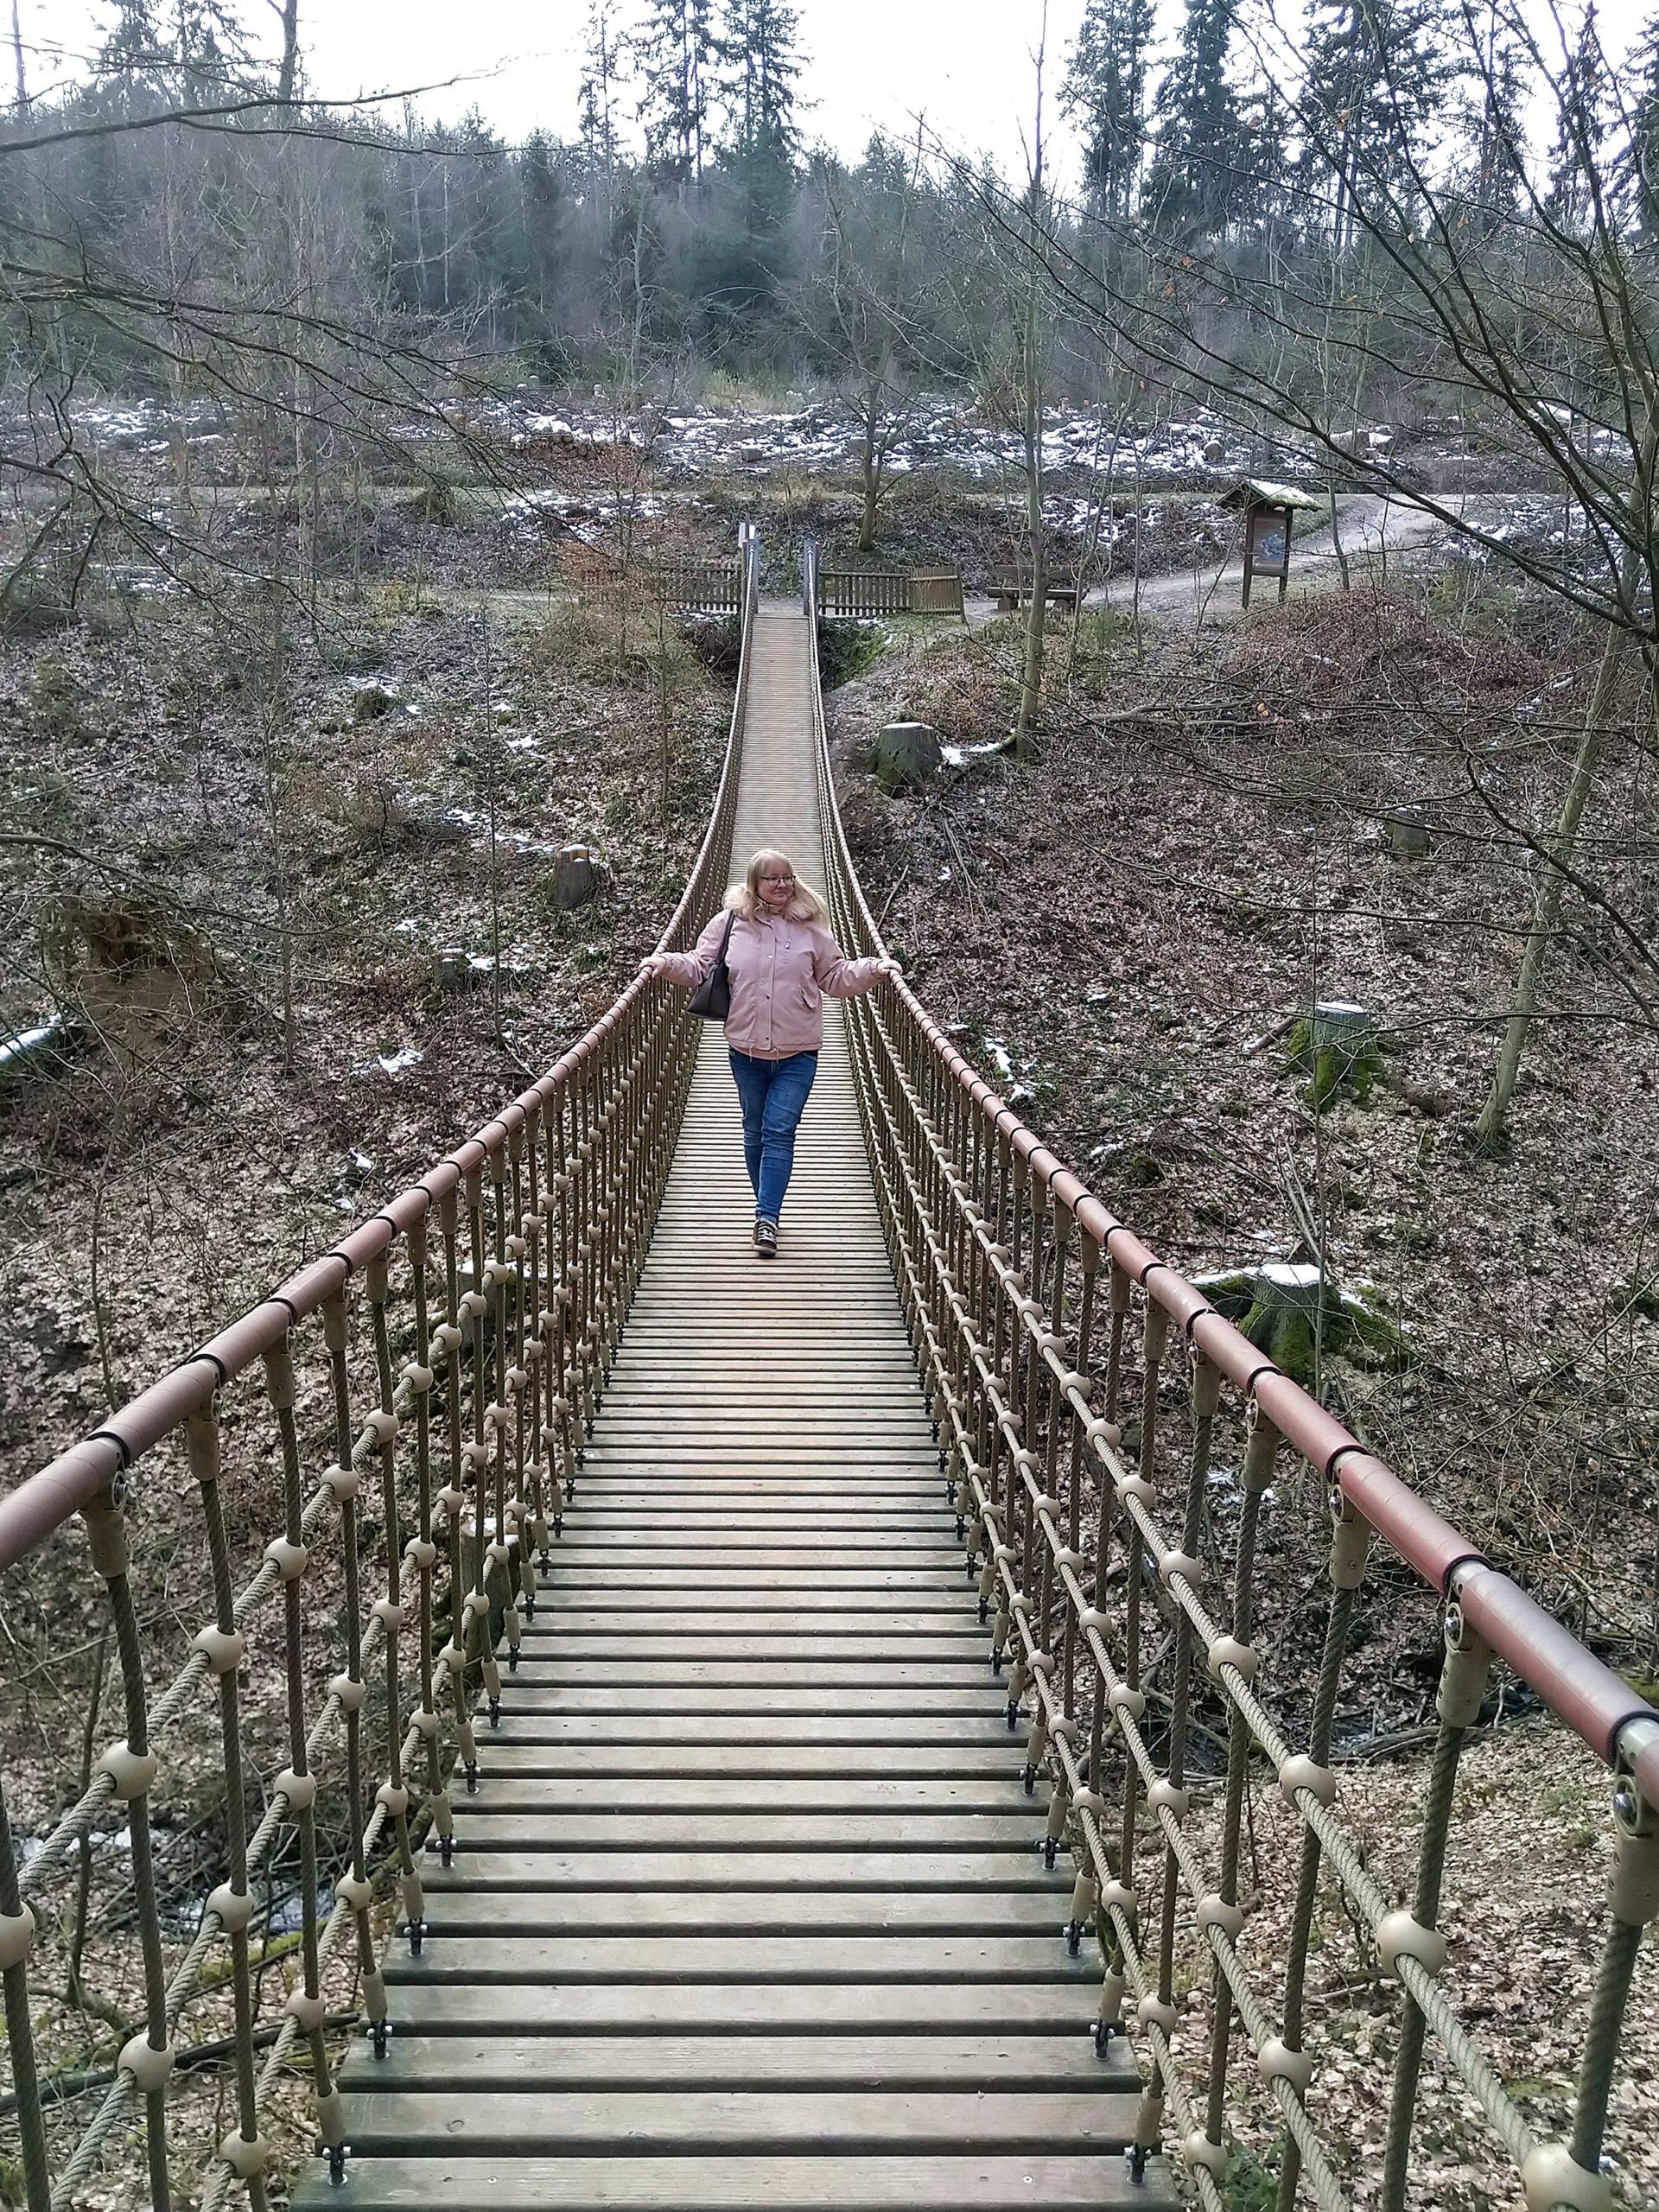 Erlebnispfad Binger Wald Hängebrücke